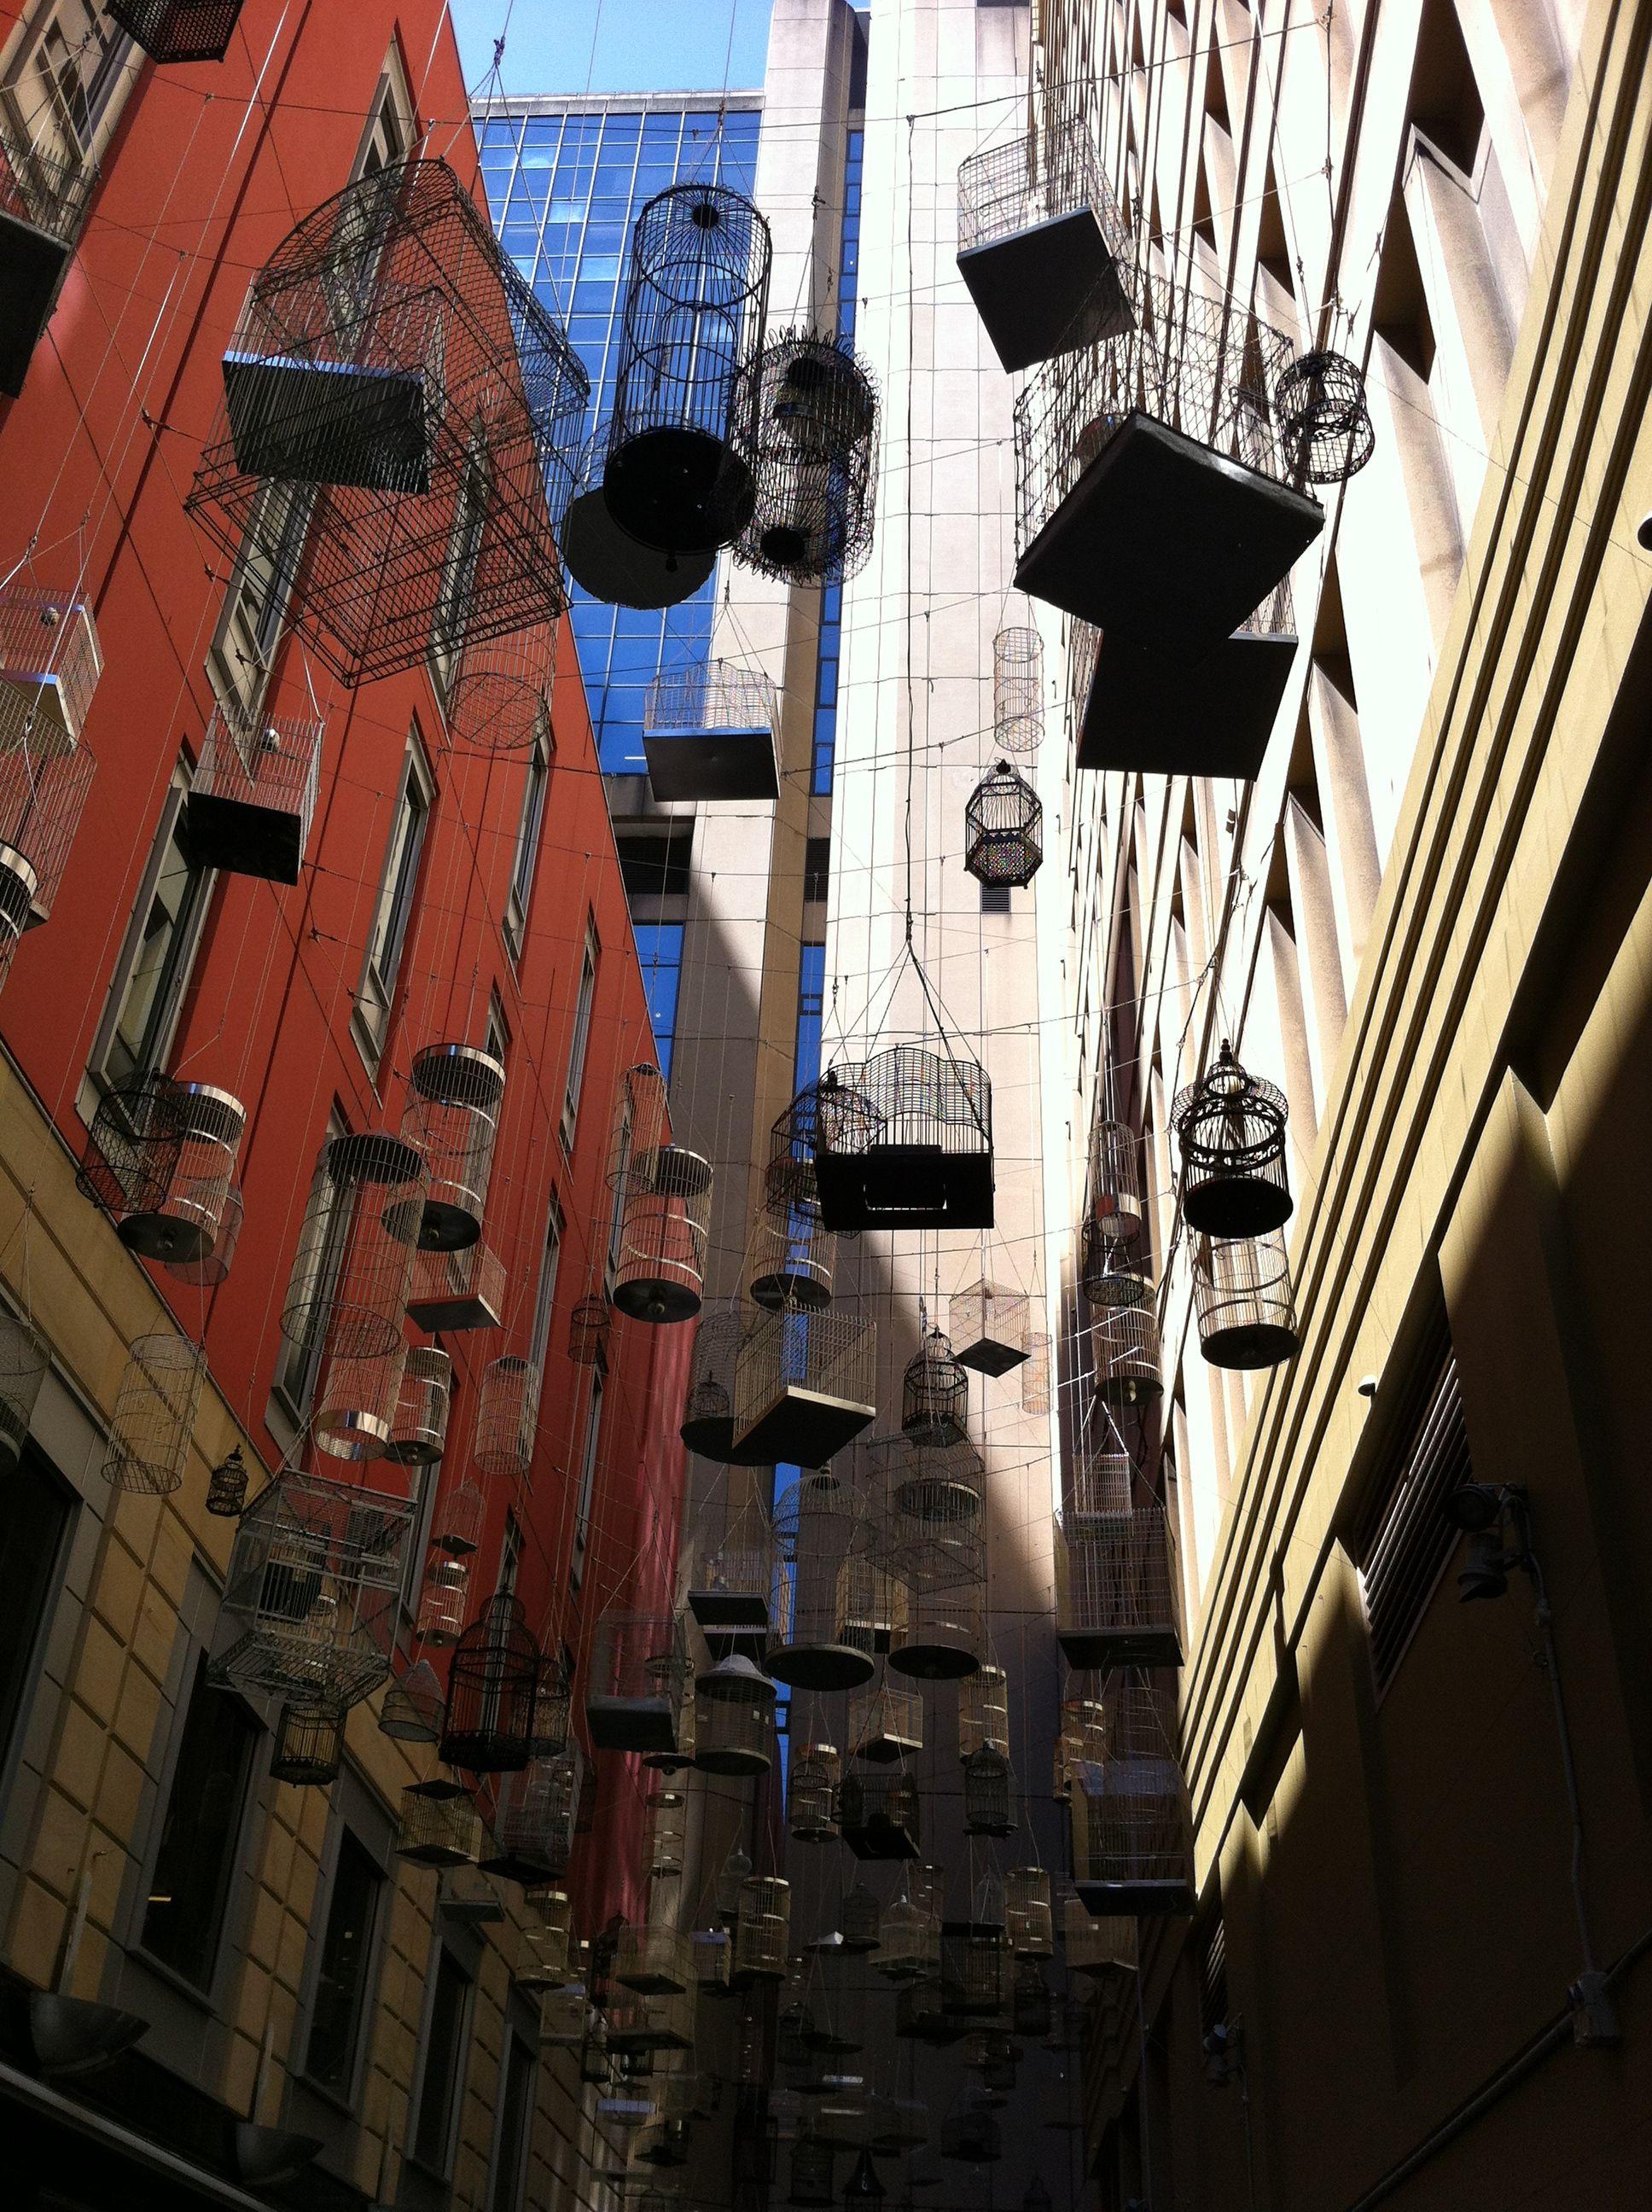 Bird cage alley - Sydney